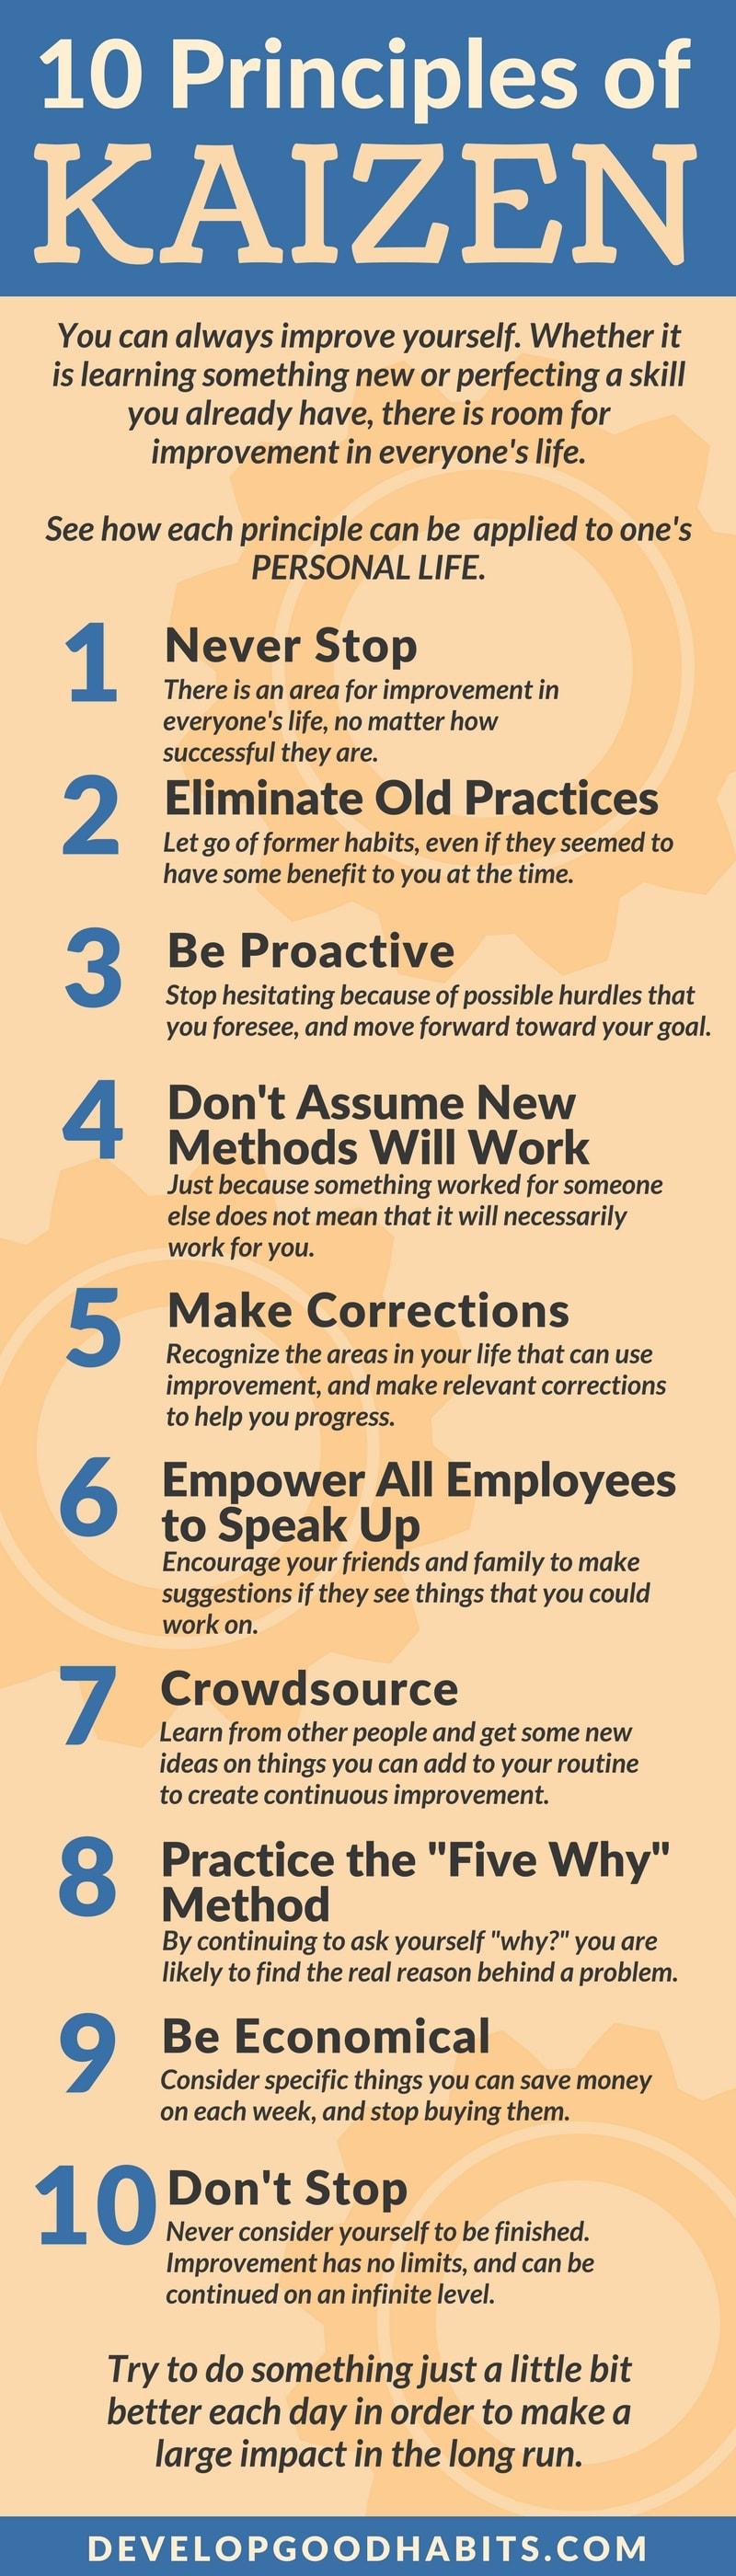 10-principles-of-kaizen.jpg